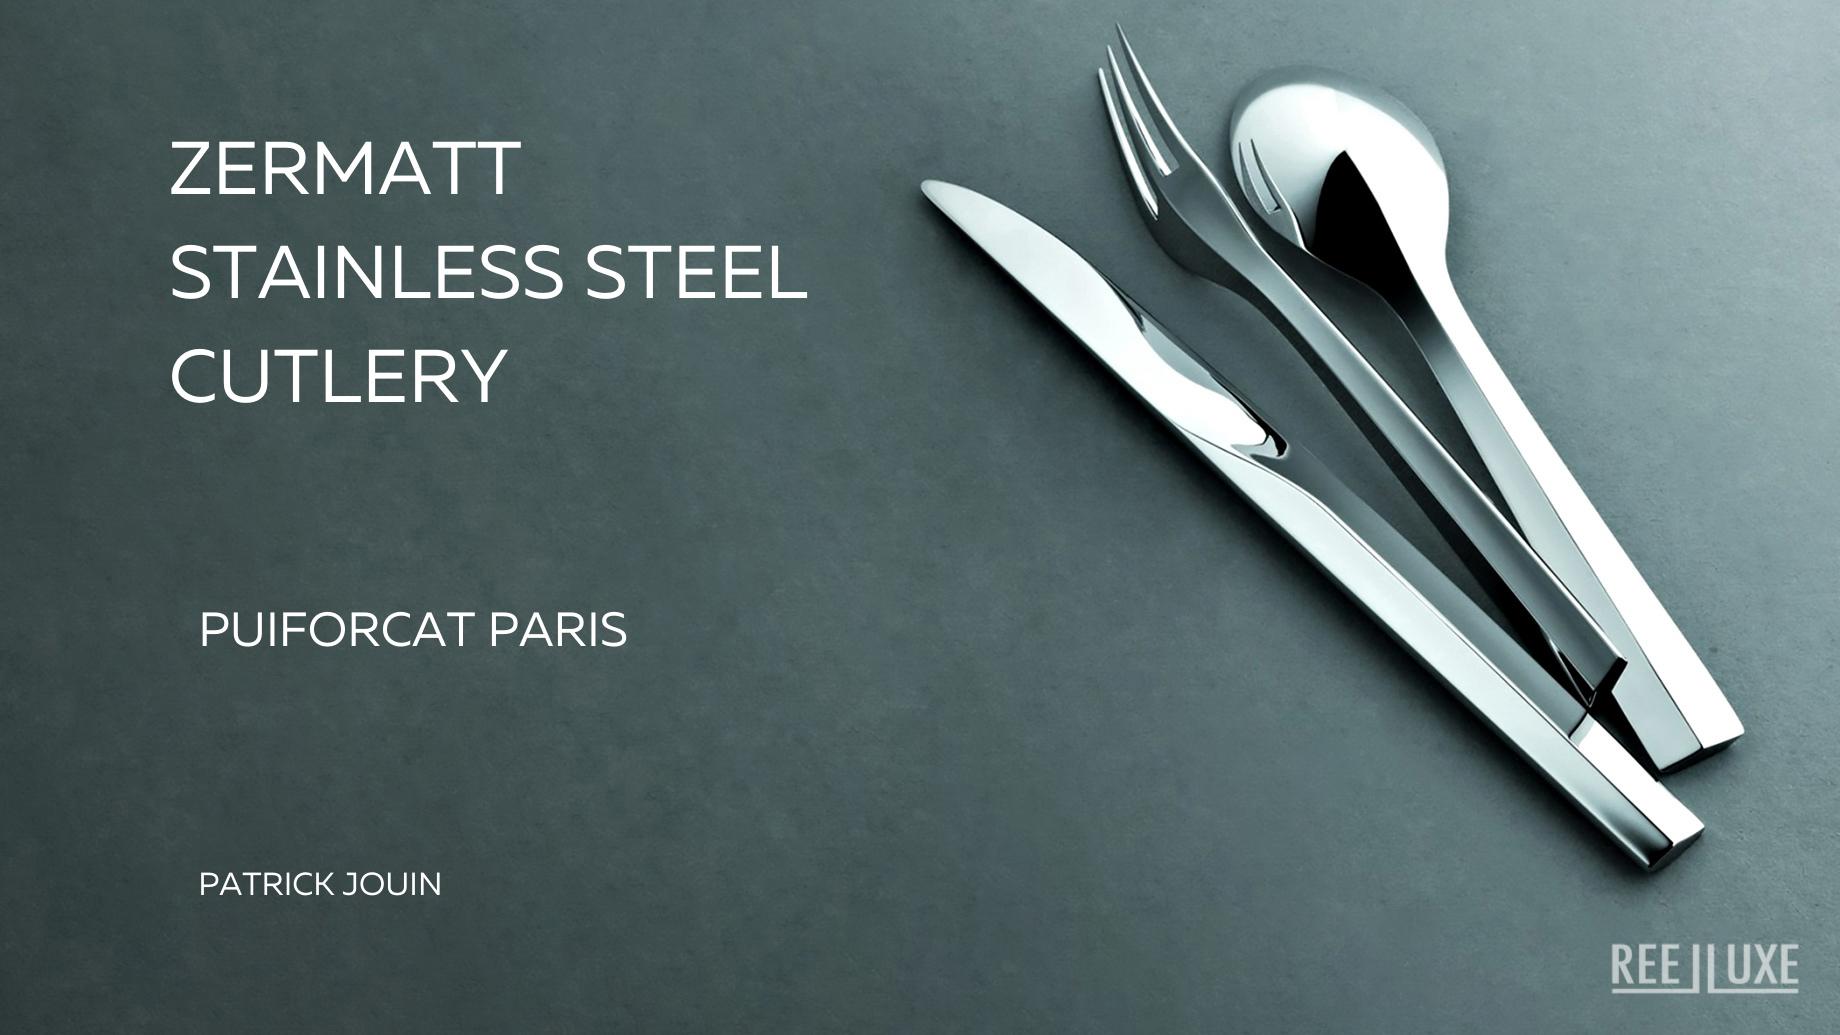 Zermatt Stainless Steel Cutlery Collection Puiforcat Paris – Patrick Jouin